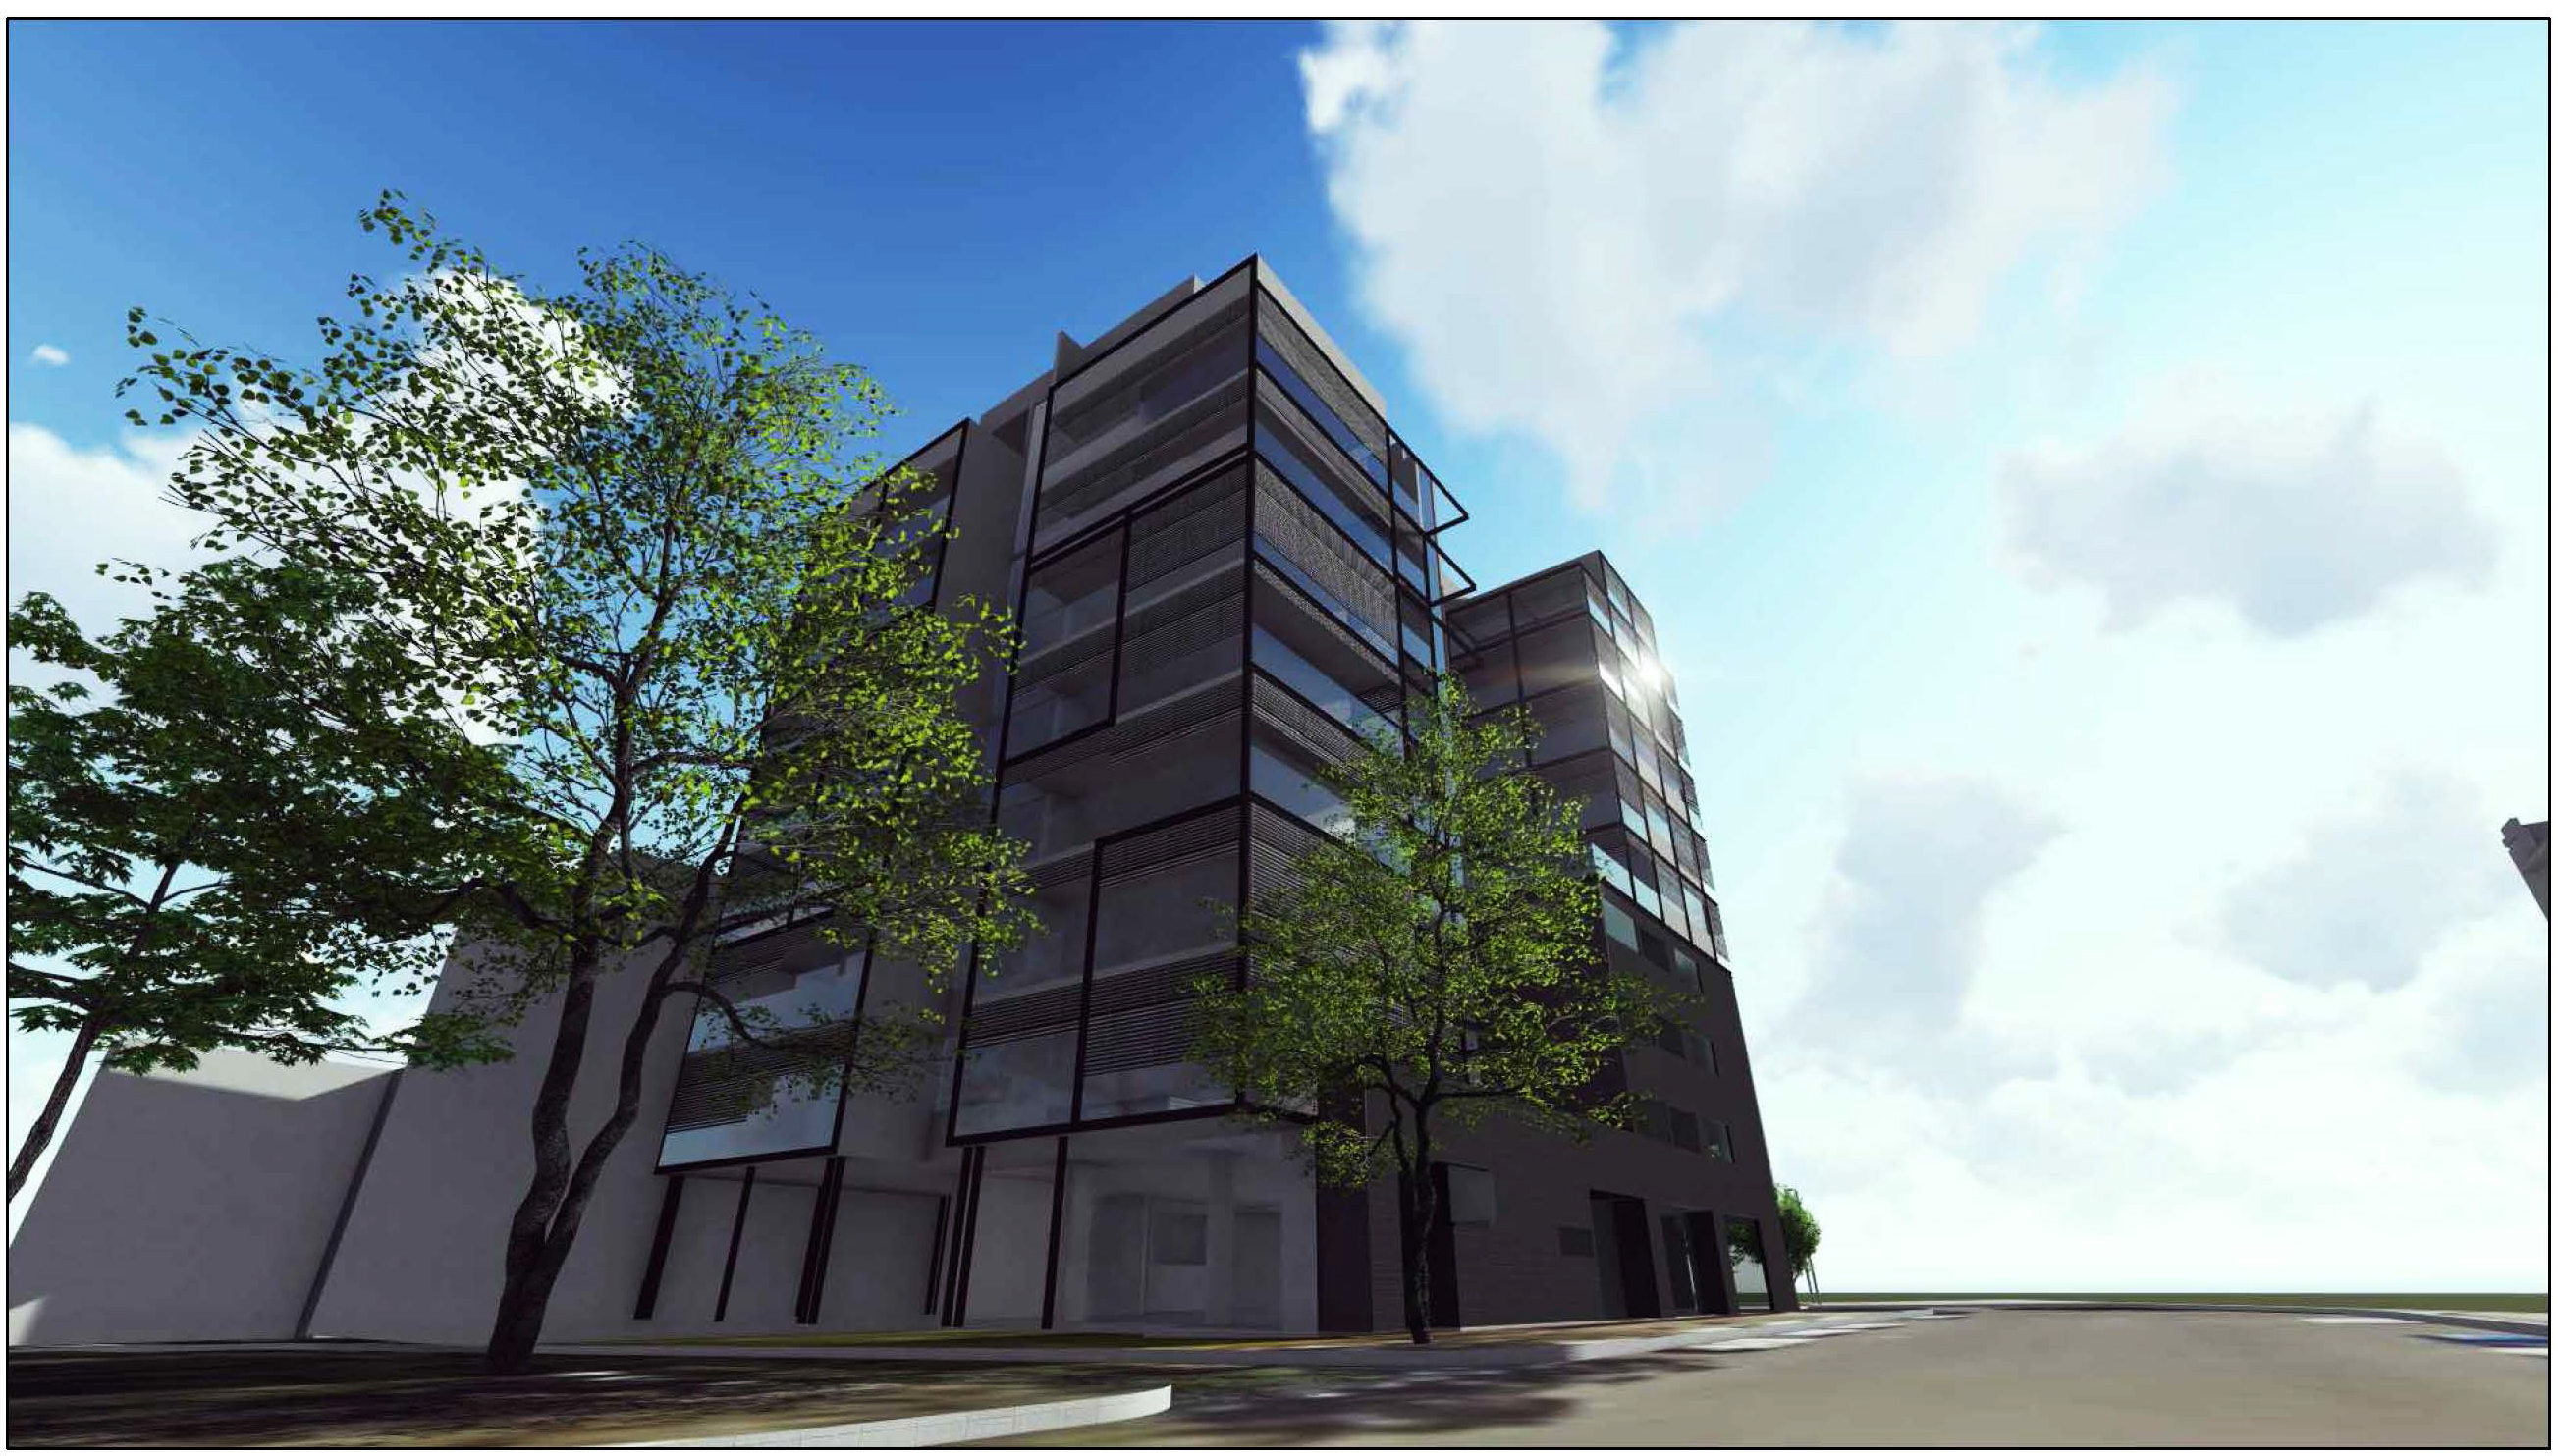 charles_tang_design_apartment_and_retail_mixed_use-sutherland 2